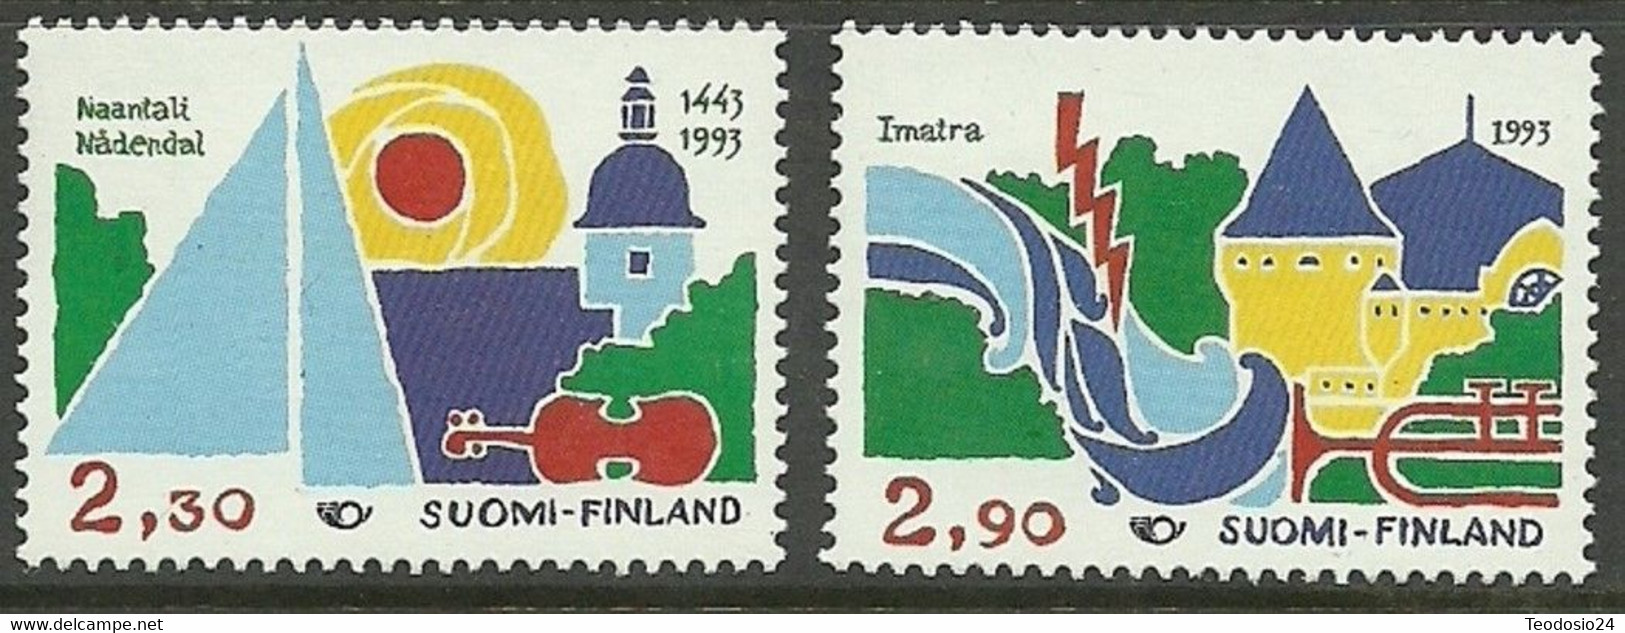 FINLANDIA 1993 Mi:FI 1210/11, Yt:FI 1176/77, AFA:FI 1199/00 ** MNH - Nuevos